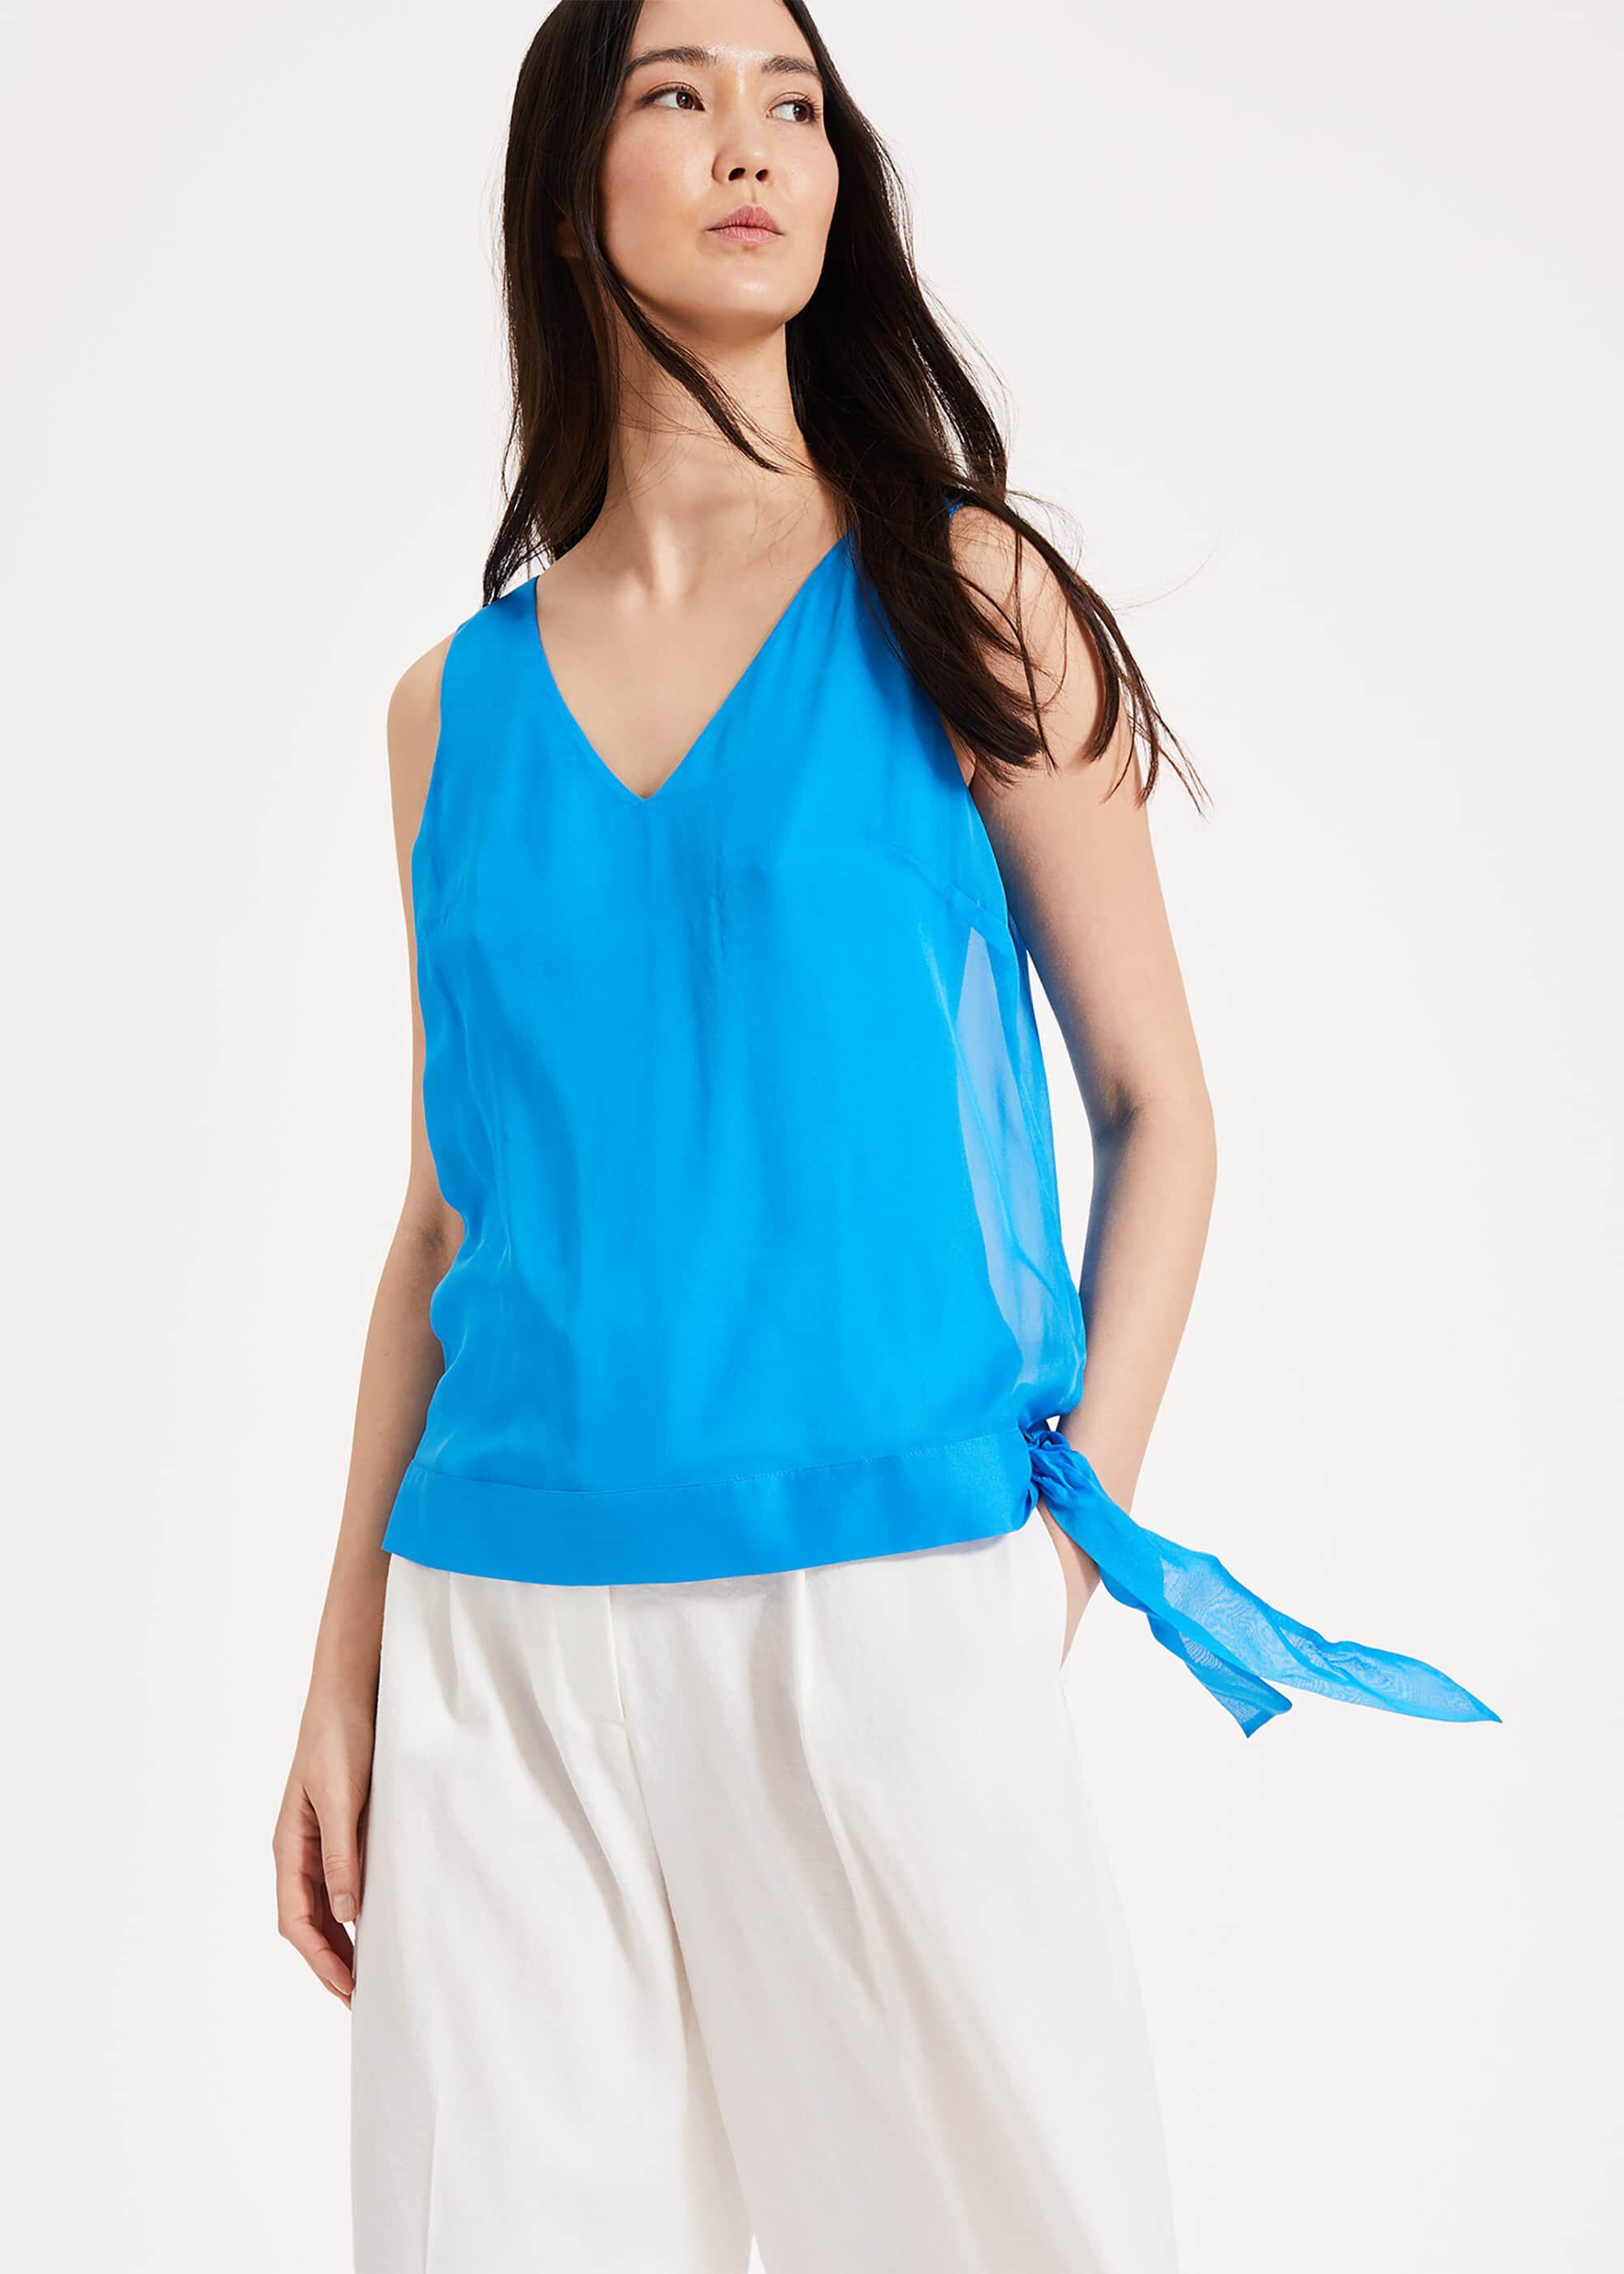 Phase Eight Eilian Silk Blouse, Blue, Blouse  - Blue - Size: 08